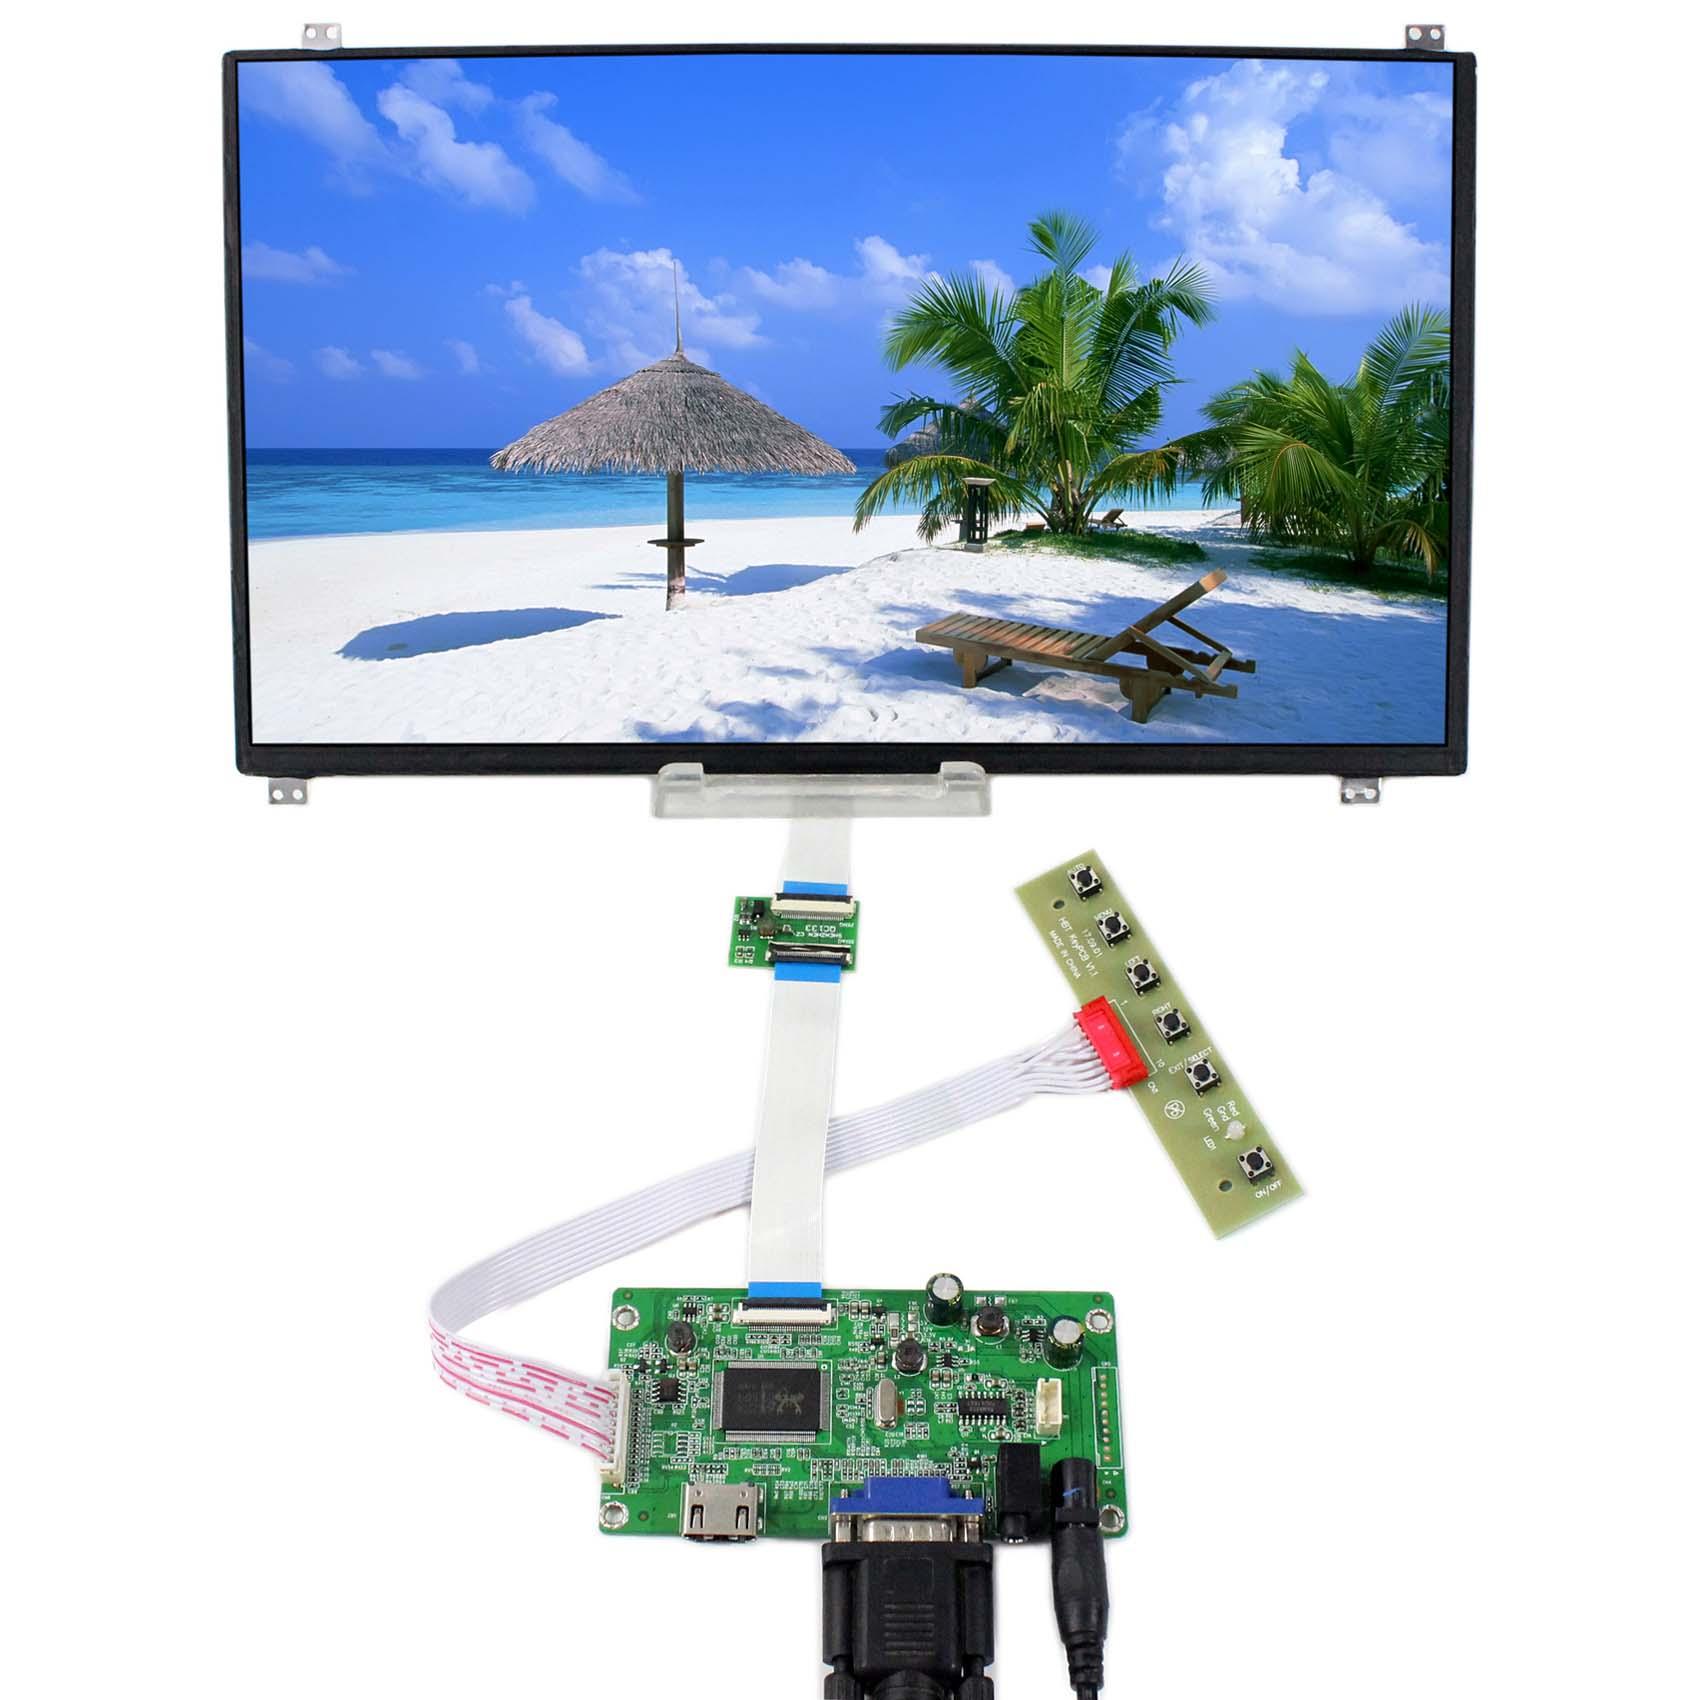 HDMI VGA Audio LCD Driver Board With 13.3inch 1920x1080 N133HSE-EB2 eDP IPS LCD Screen vga hdmi lcd controller board for lp156whu tpb1 lp156whu tpa1 lp156whu tpbh lp156whu tpd1 15 6 inch edp 30 pins 1 lane 1366x768